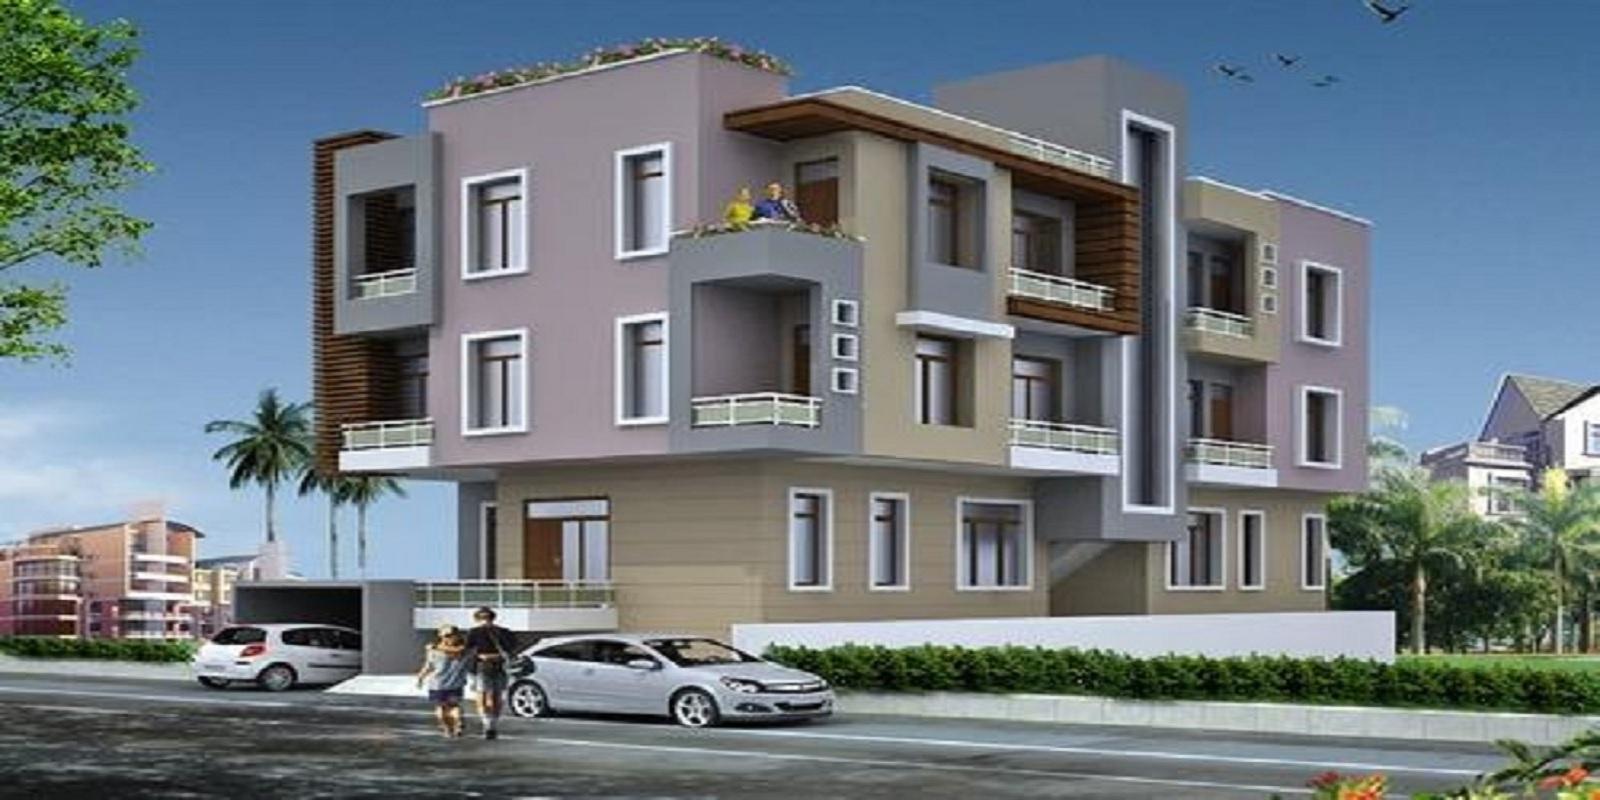 pashankar guruprasad project project large image1